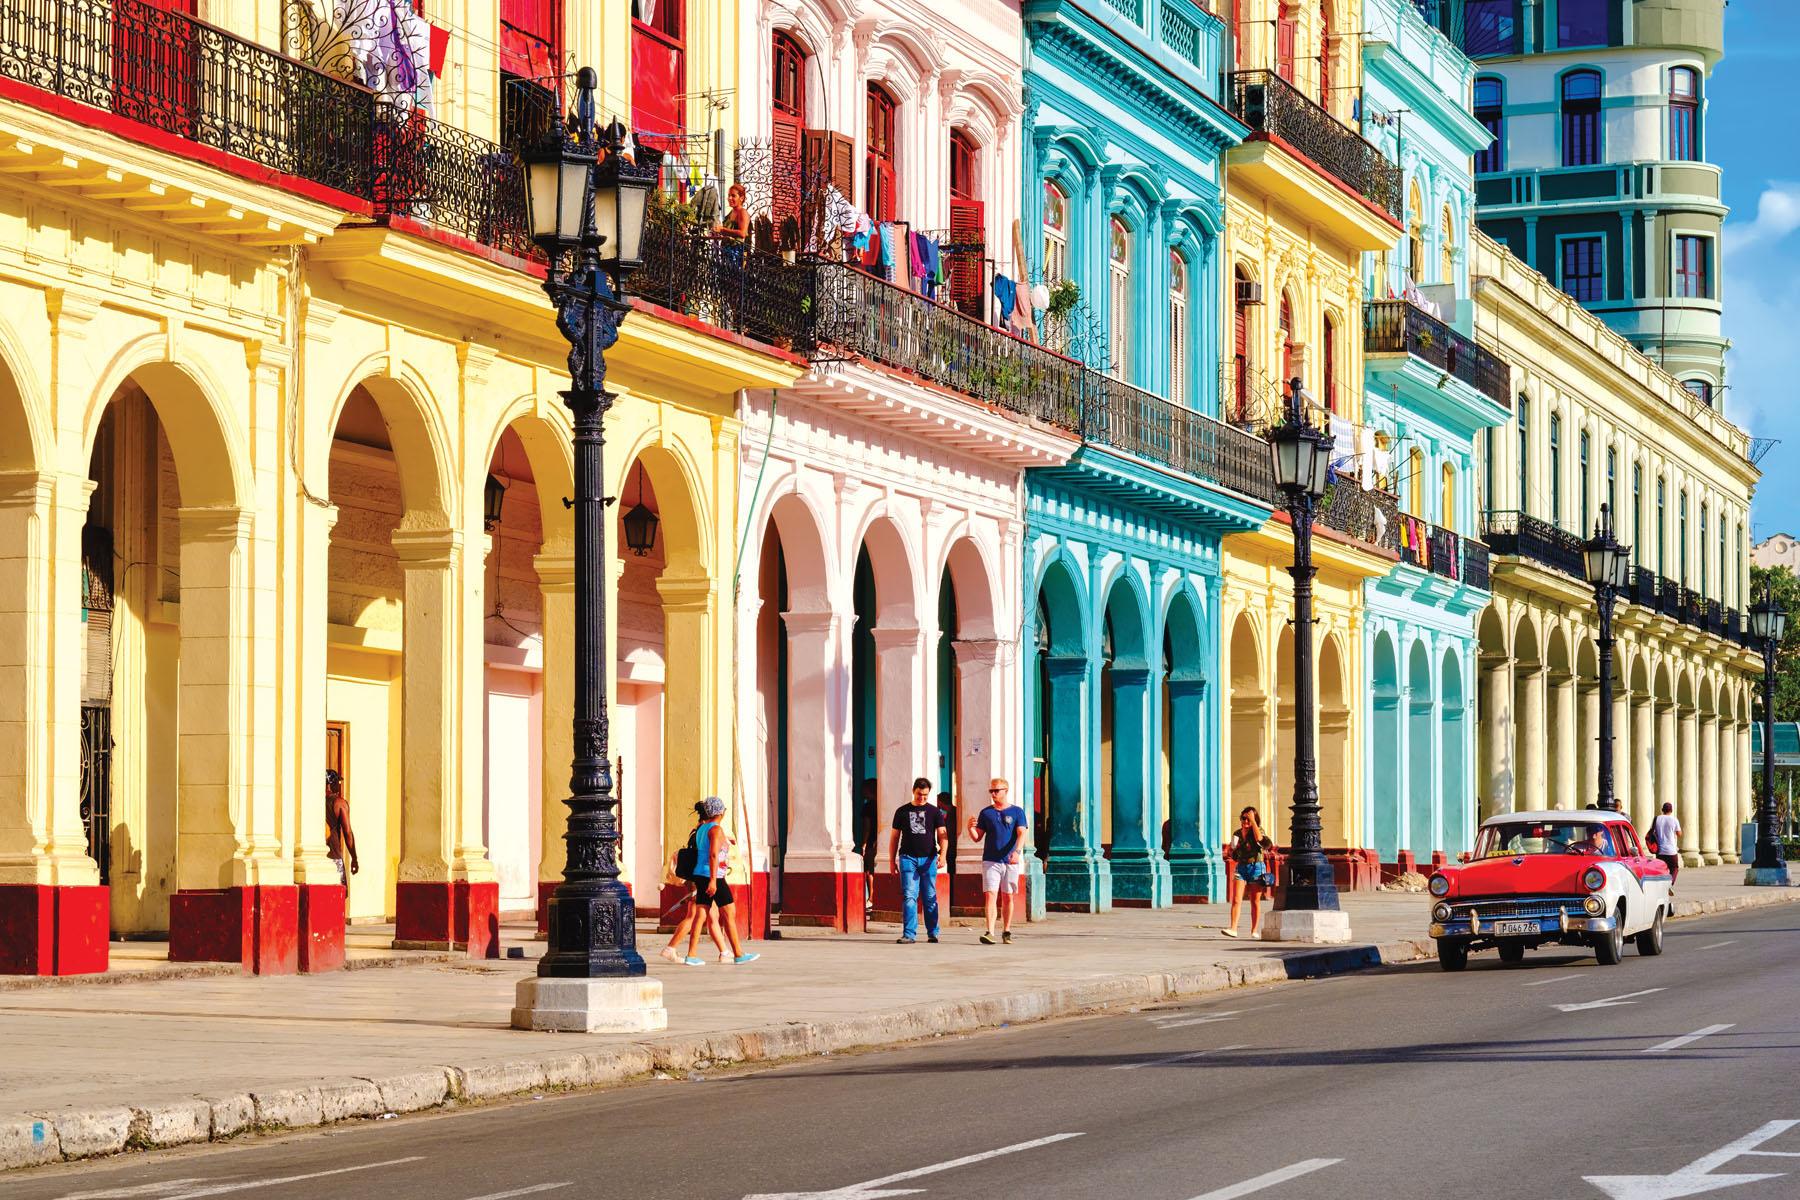 Cuba-Havana_1176936913_1